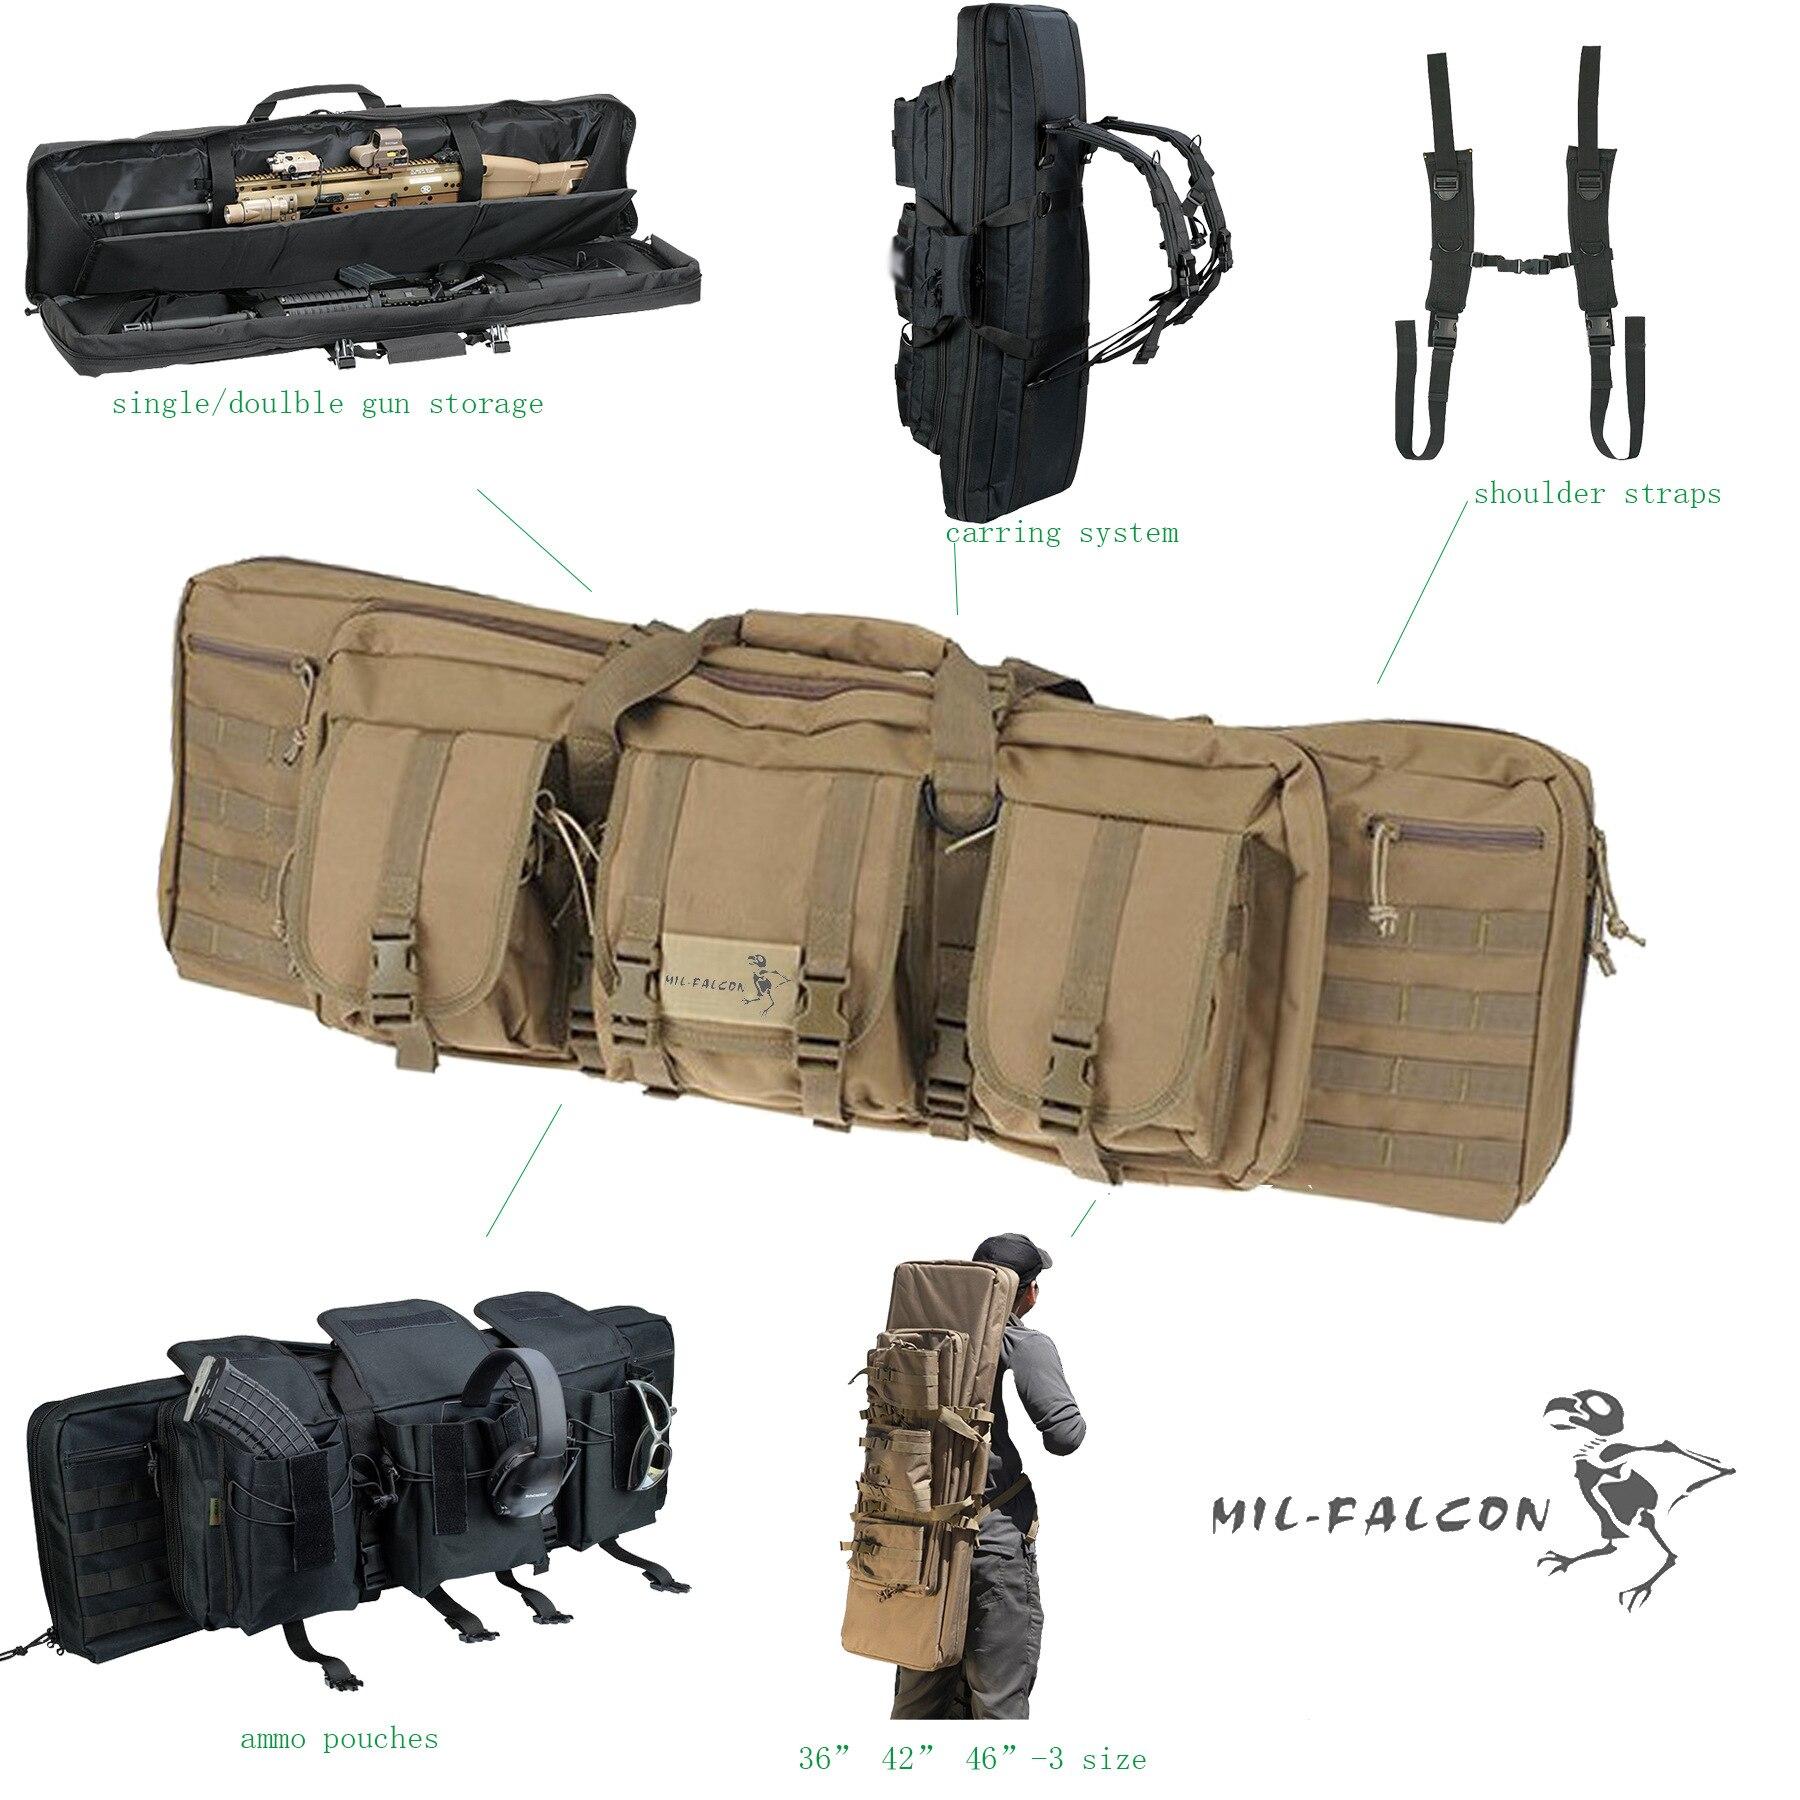 Gun Bag Outdoor Hunting Tool Shooting Bag Tactical Sniper Rifle Bag 36 Inch Double Lancet Bag A4846 47 tactical hunting padded rifle sniper gun sling carrying case black